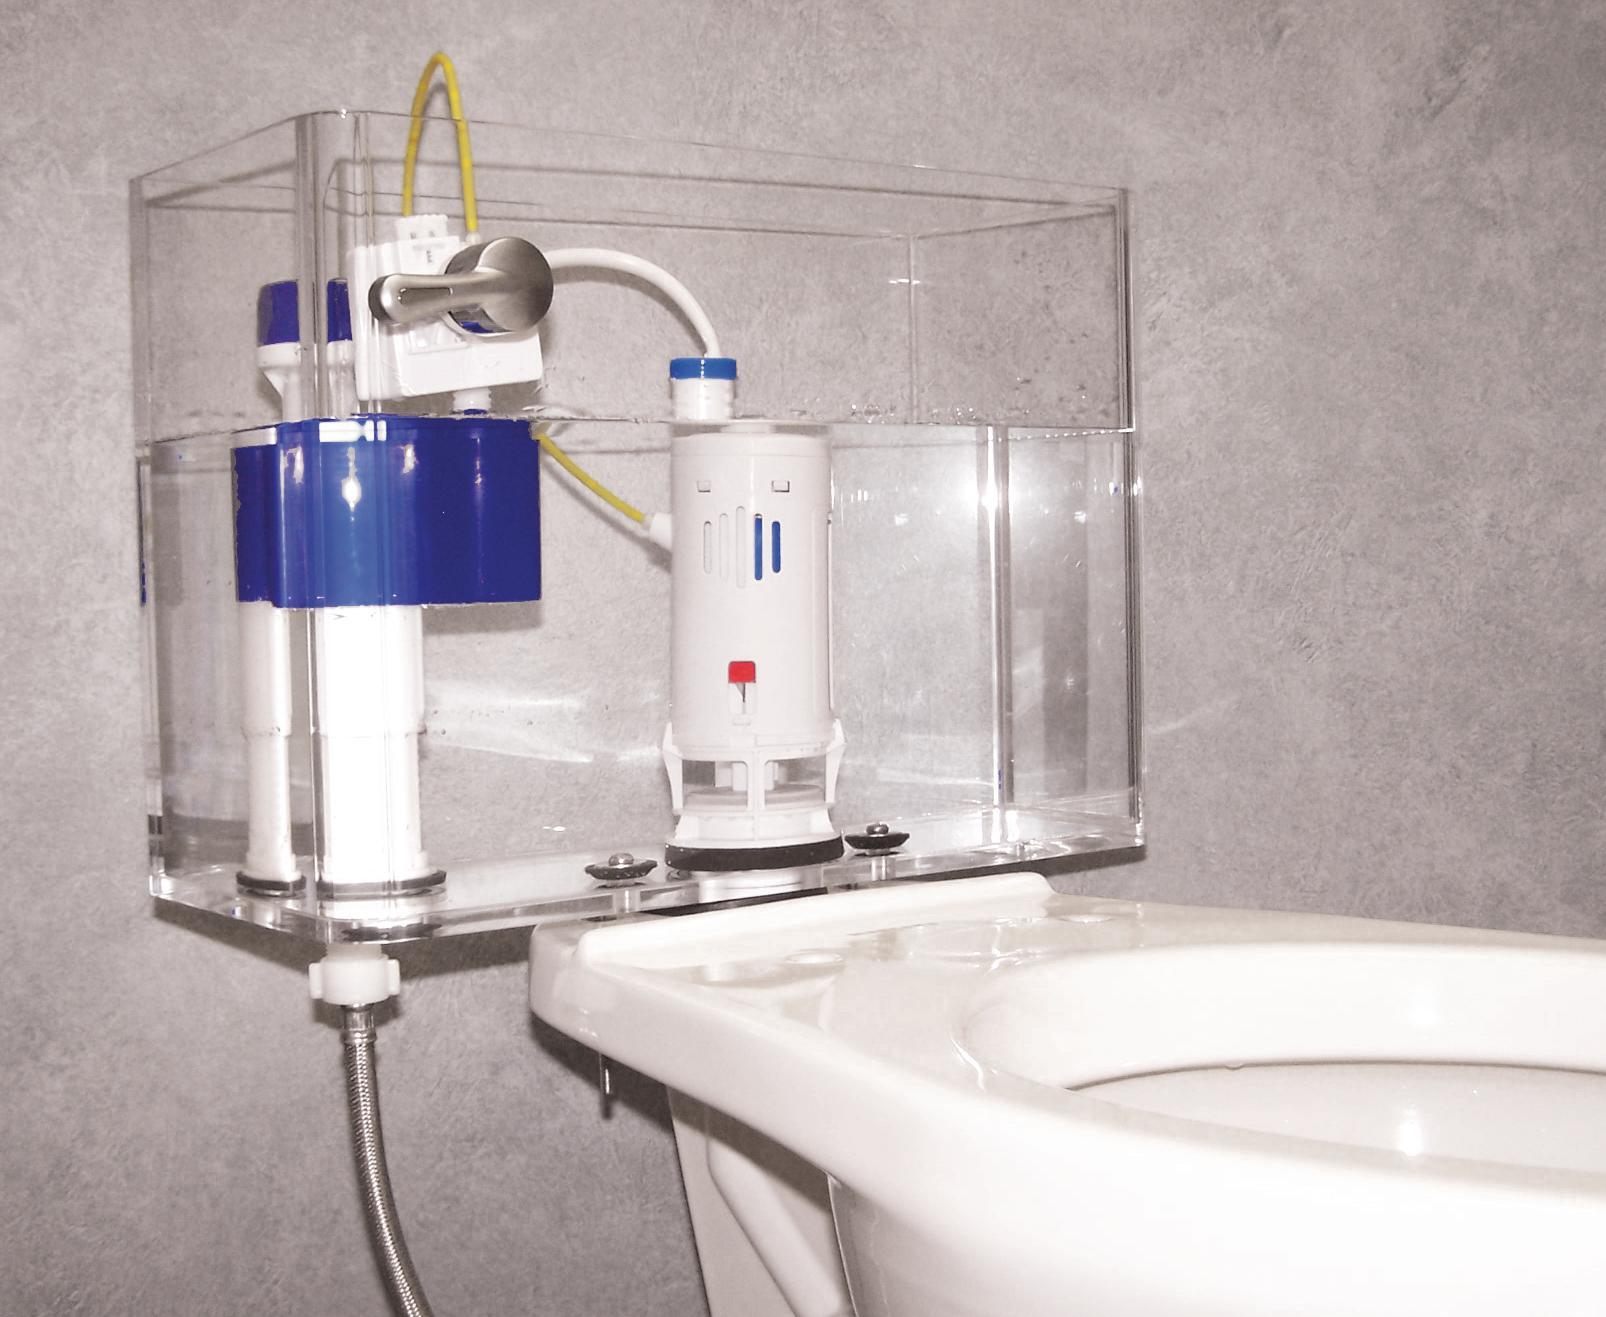 smarter flush dual flush toilet retrofit kit remodeling toilets bath green products. Black Bedroom Furniture Sets. Home Design Ideas